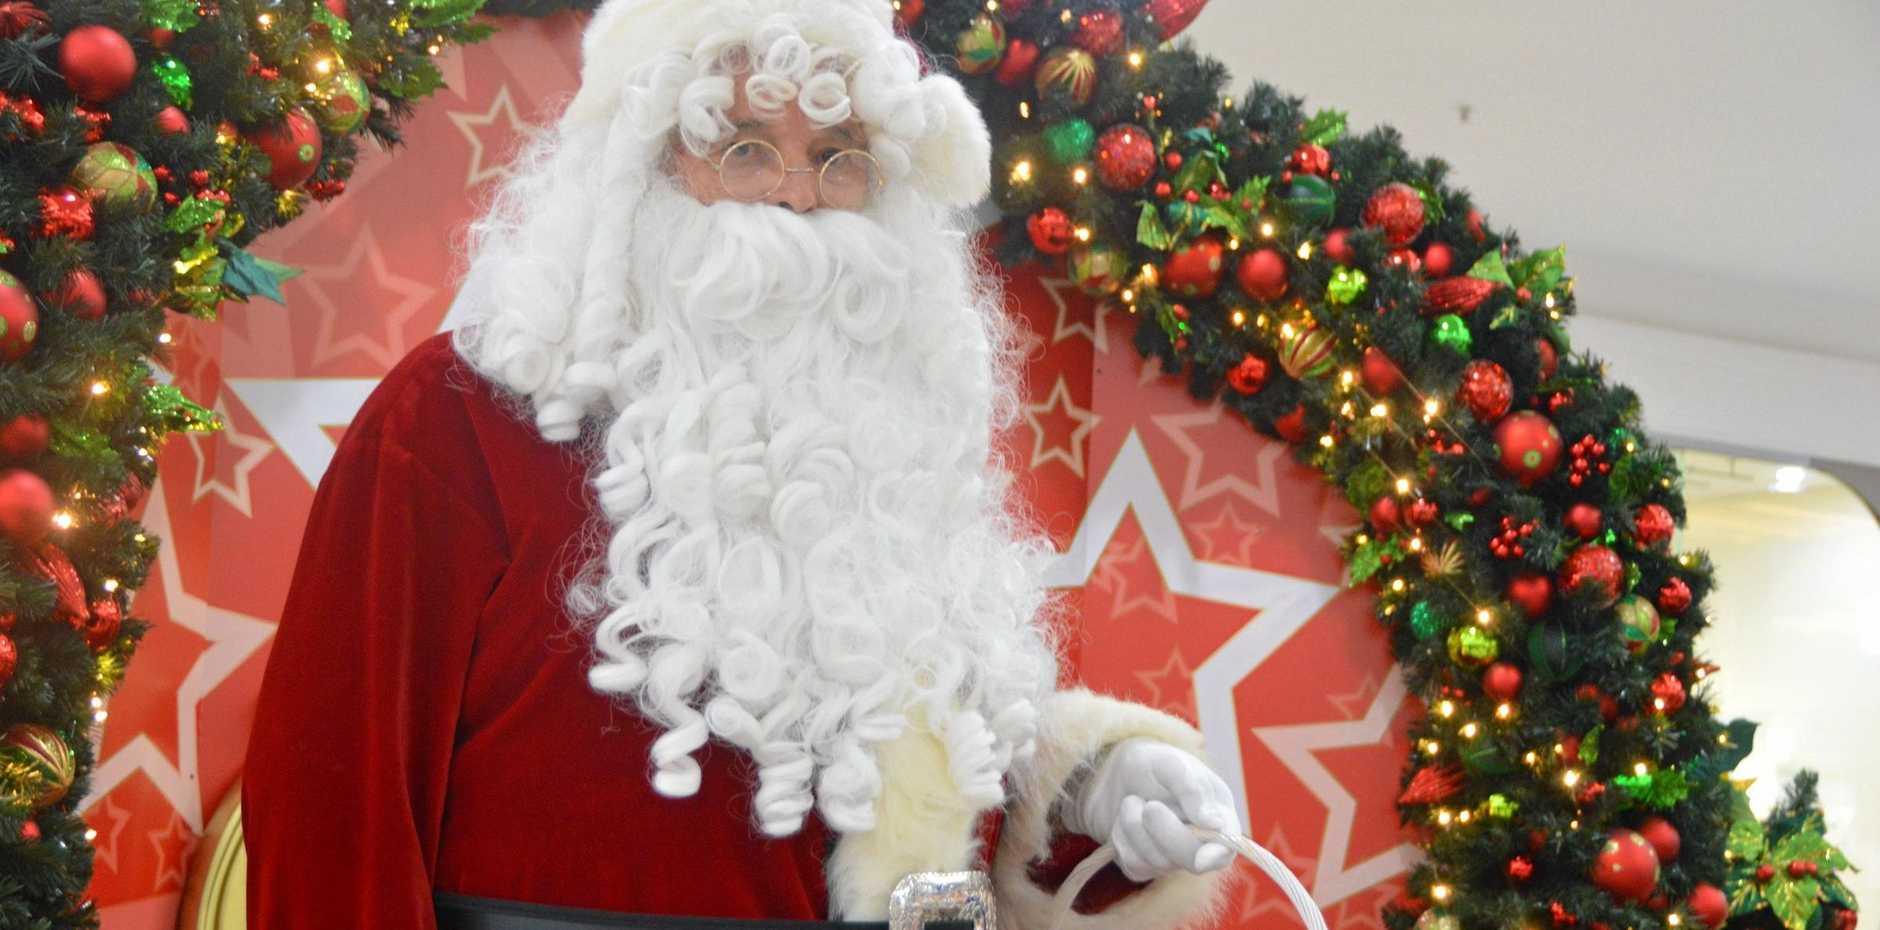 SPREADING THE JOY: The Santa at Kingaroy Shoppingworld loves to keep the spirit of the season alive.